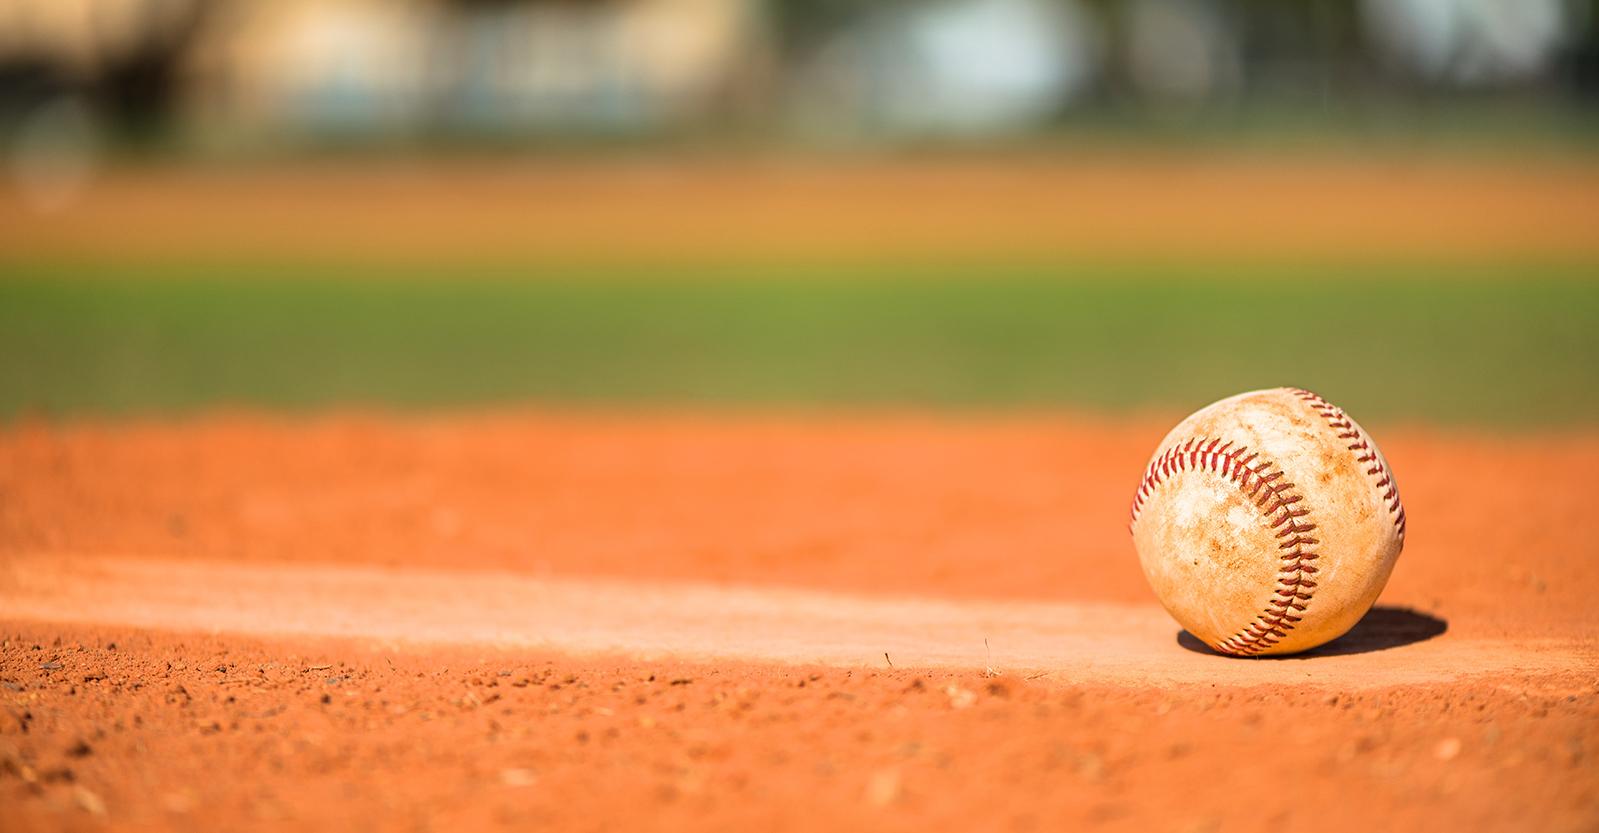 Baseball sitting on the pitcher's mound